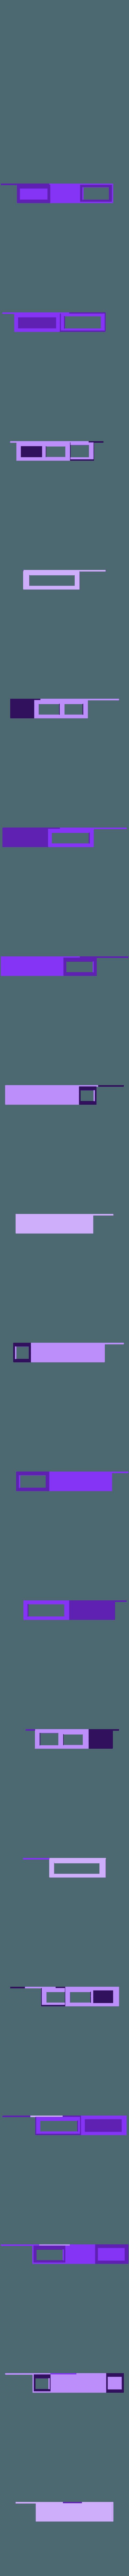 kevskyqVESA75100.stl Download STL file SKY Q MINI BEHIND TV HANGING MOUNT VESA COMPATIBLE • 3D printer template, beanieboy182